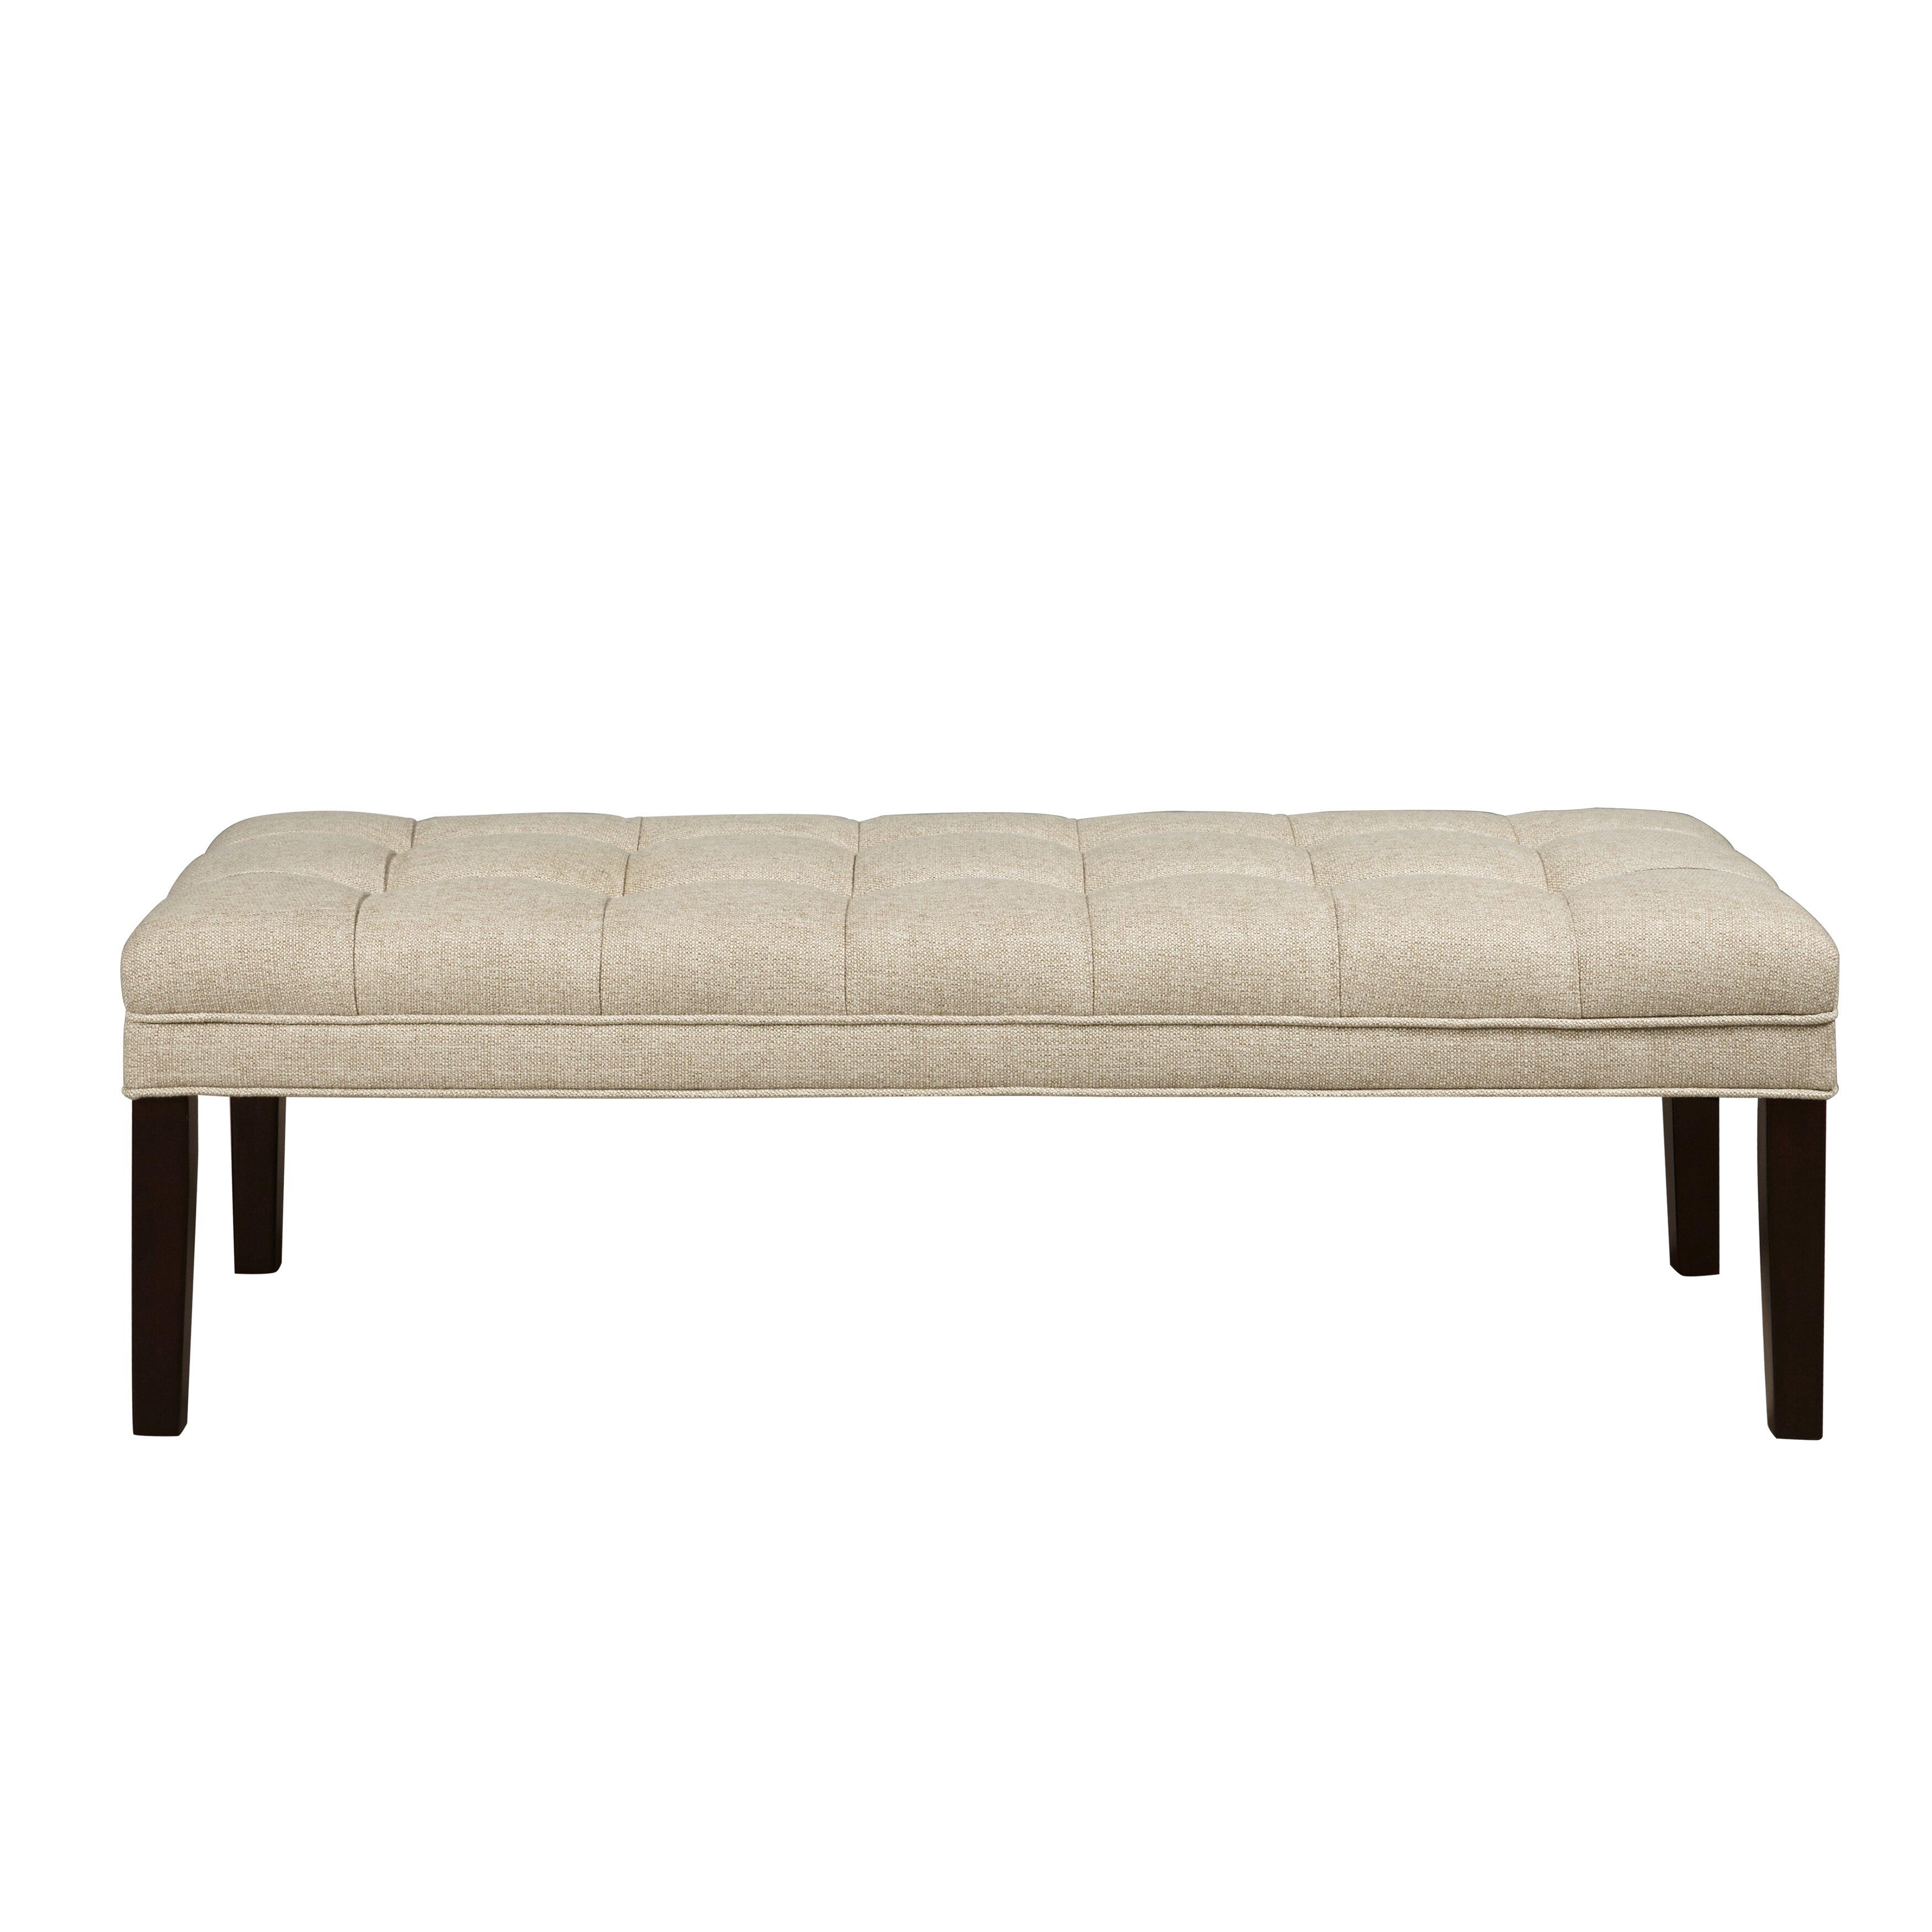 pri upholstered tufted bedroom bench reviews